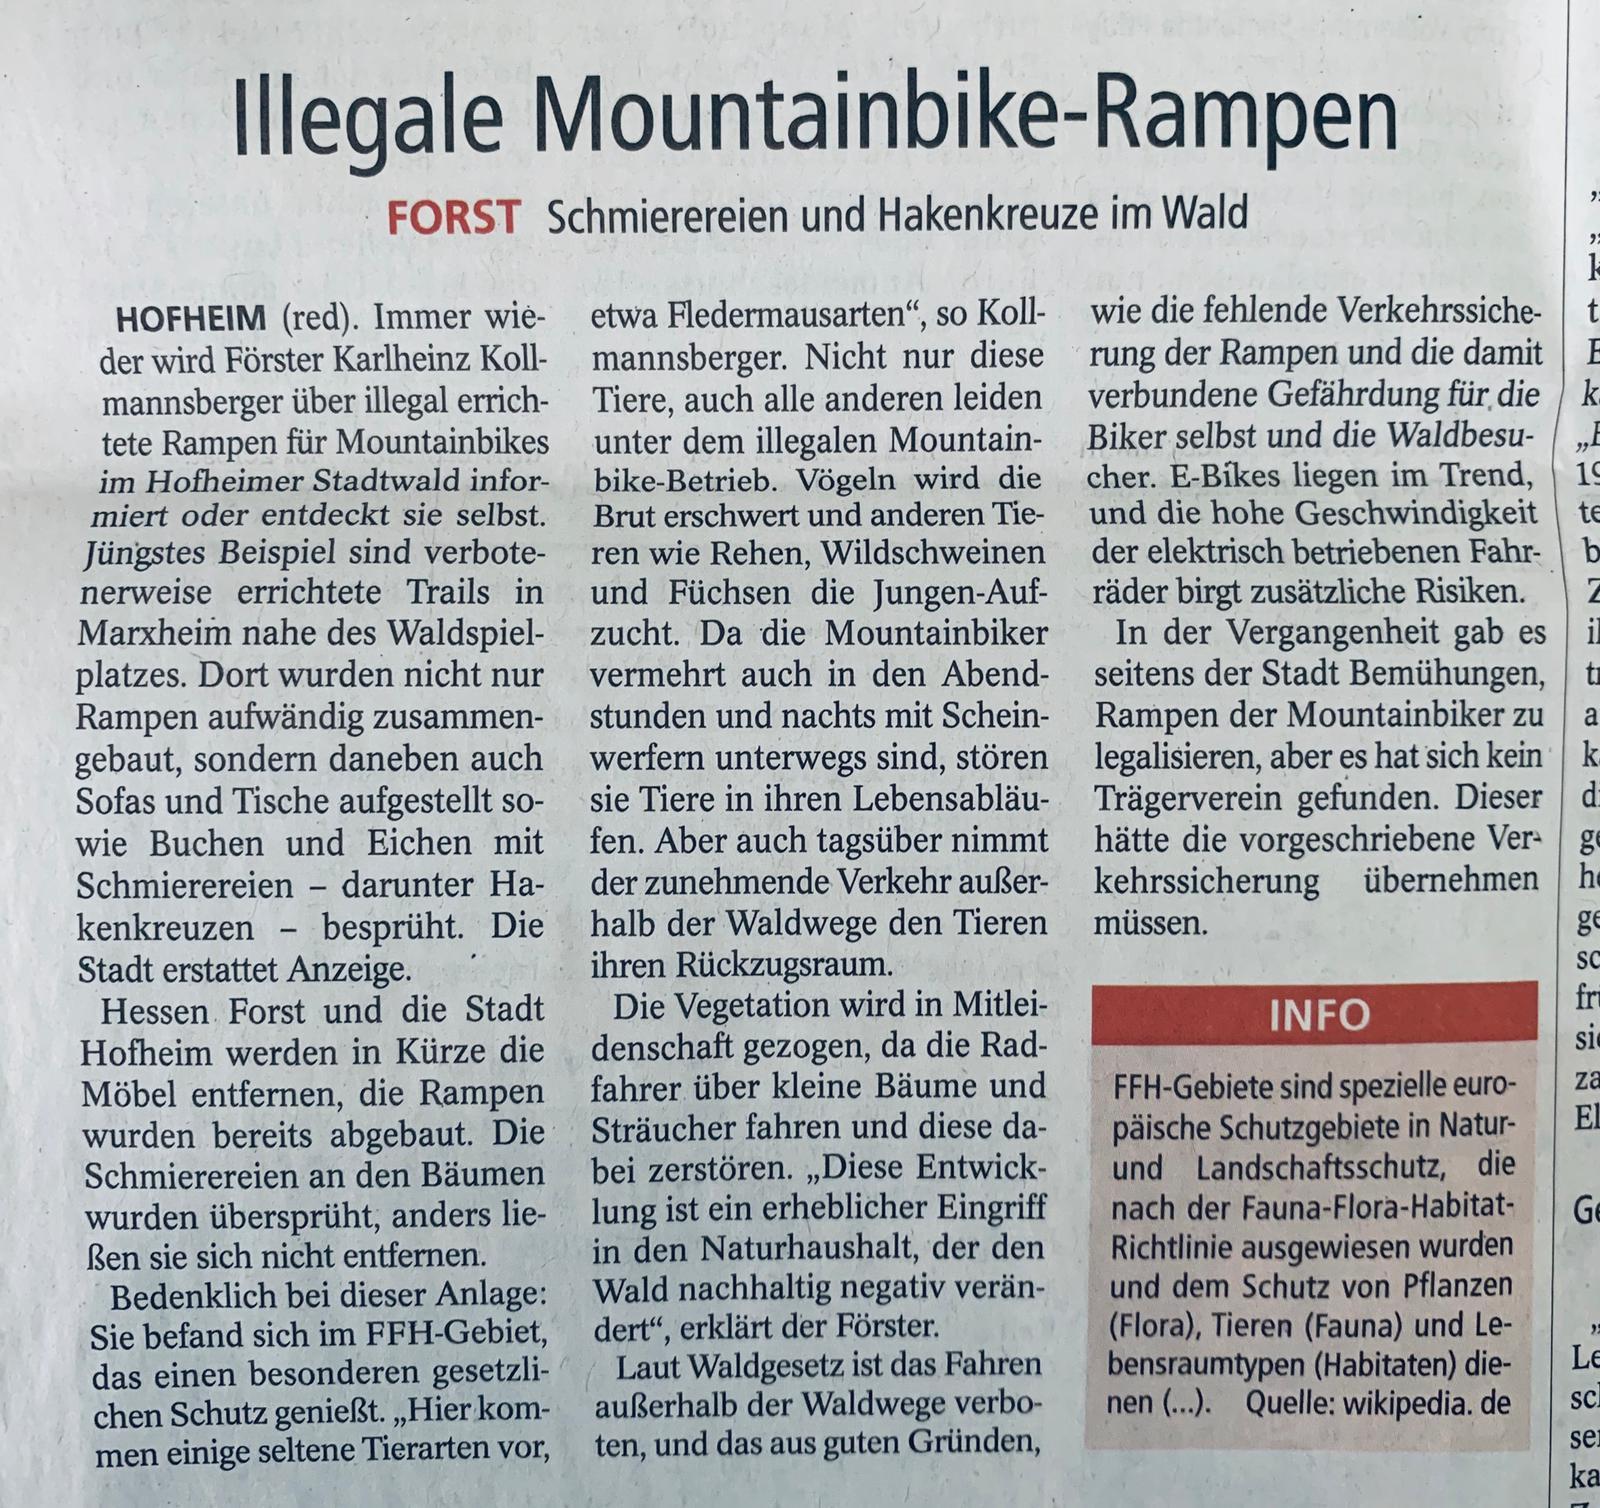 Illegale Mountainbike-Rampen.jpeg